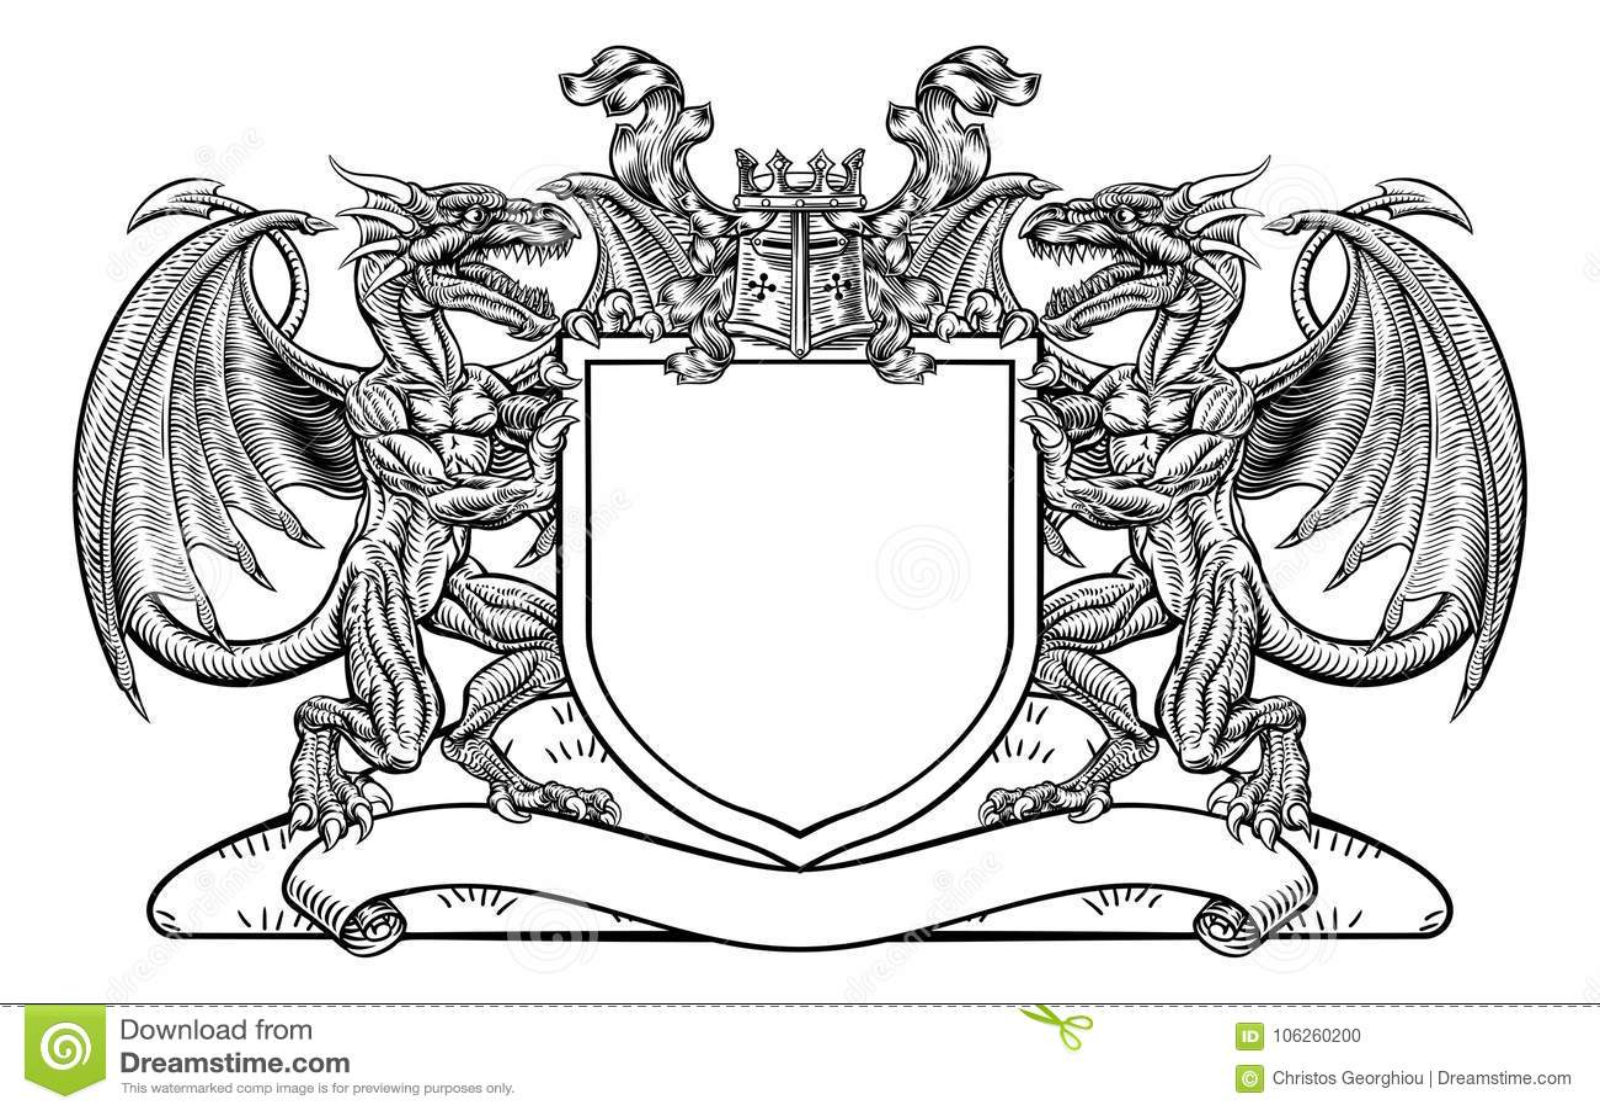 Dragon Shield Heraldic Crest Coat Of Arms Emblem Stock Vector Illustration Of Crown Crest 106260200